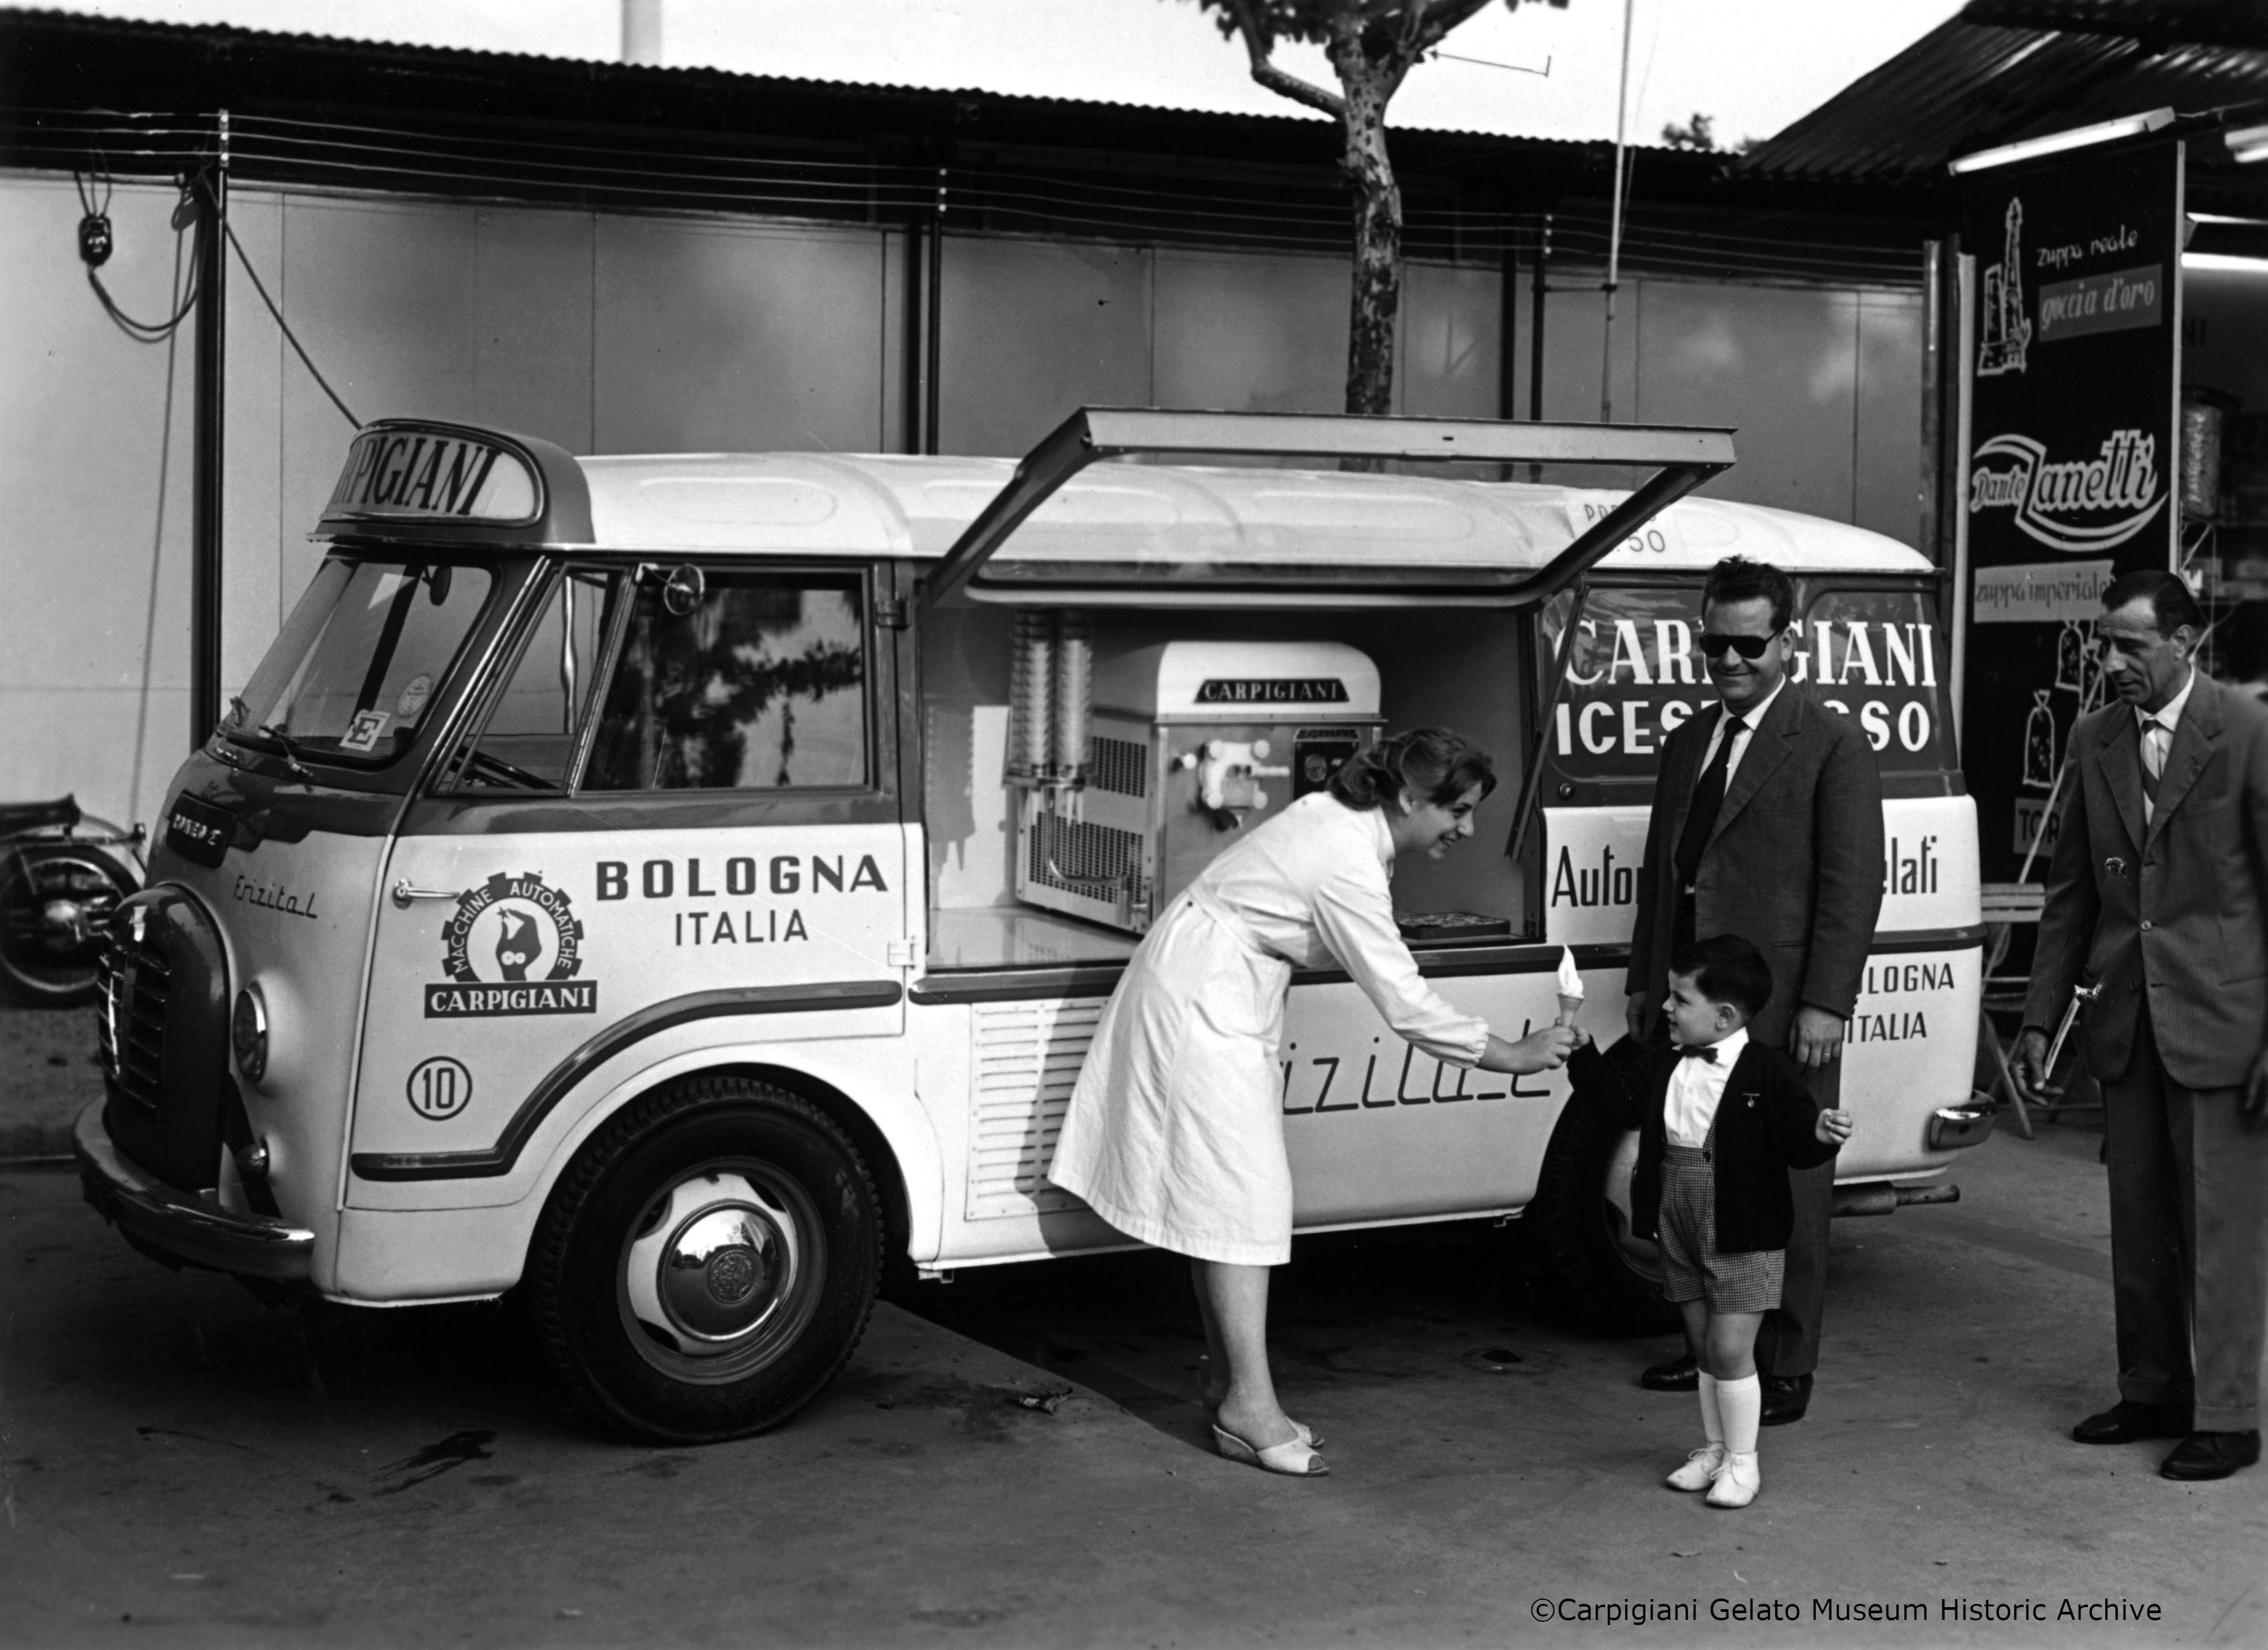 Carpigiani vehicle carrying soft serve machine